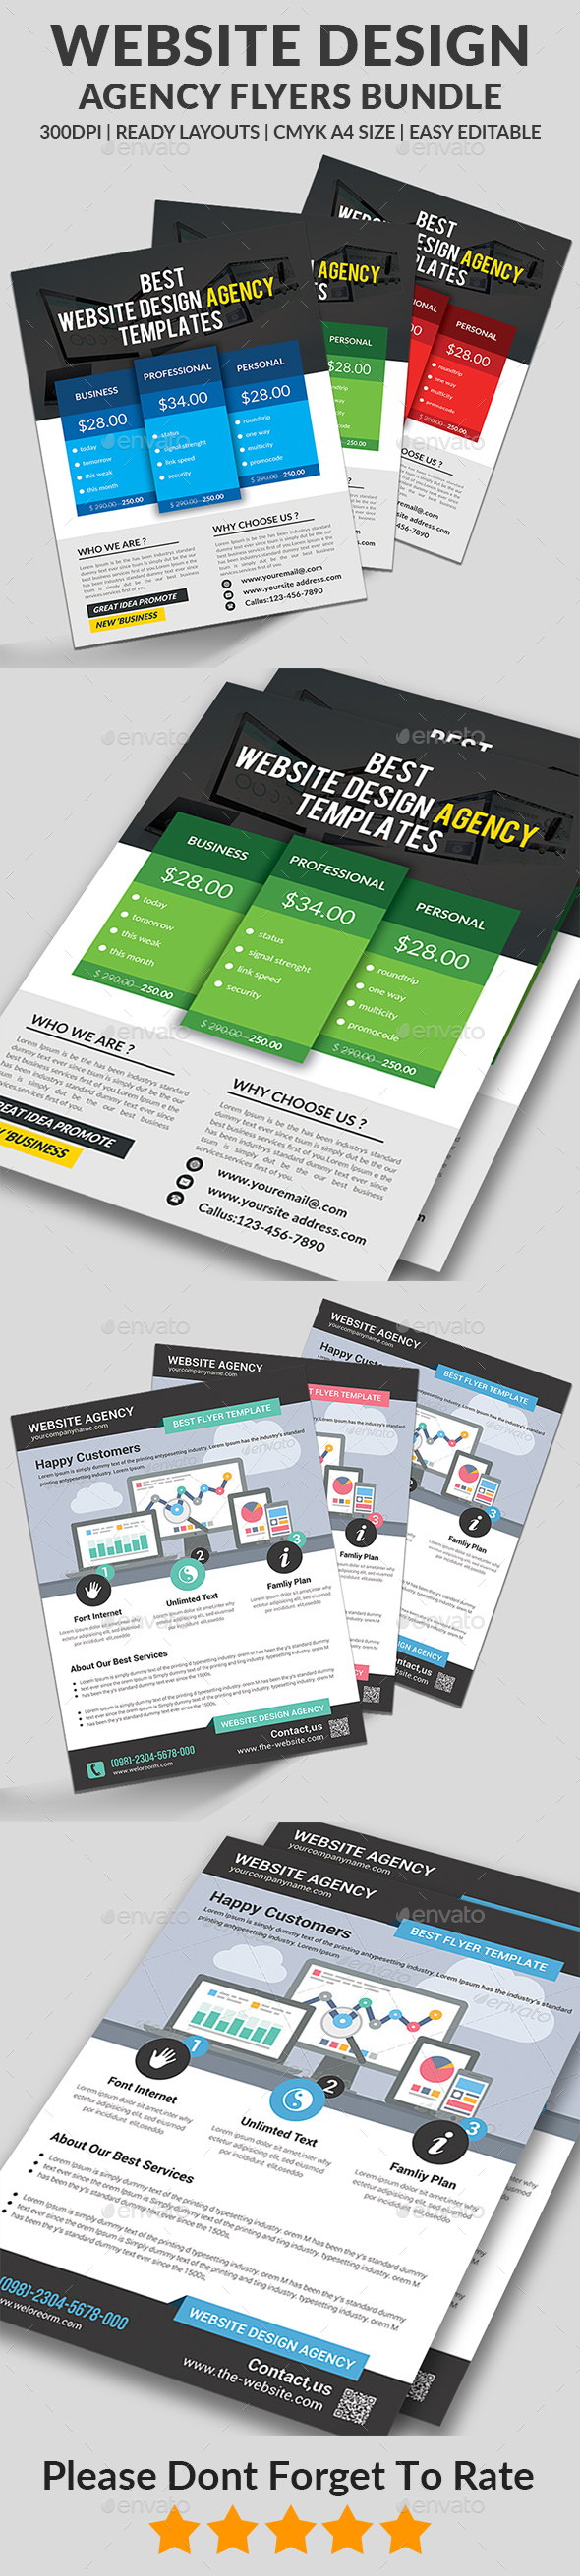 Website Design Agency Flyers Bundle - Corporate Flyers